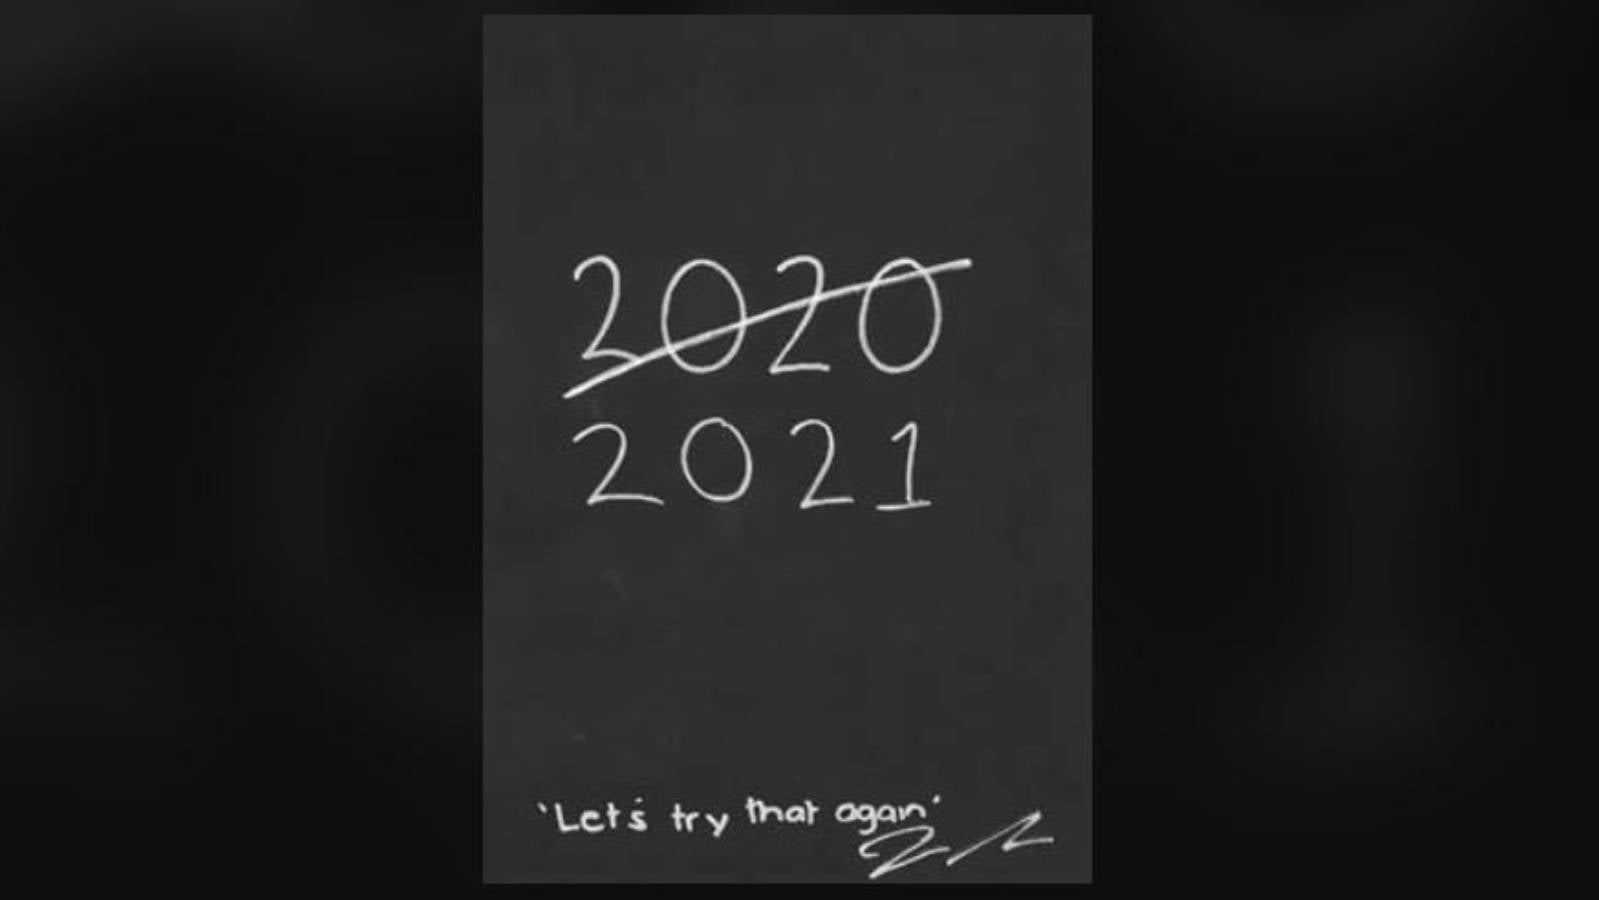 Jacinda Ardern's arty take on 2020